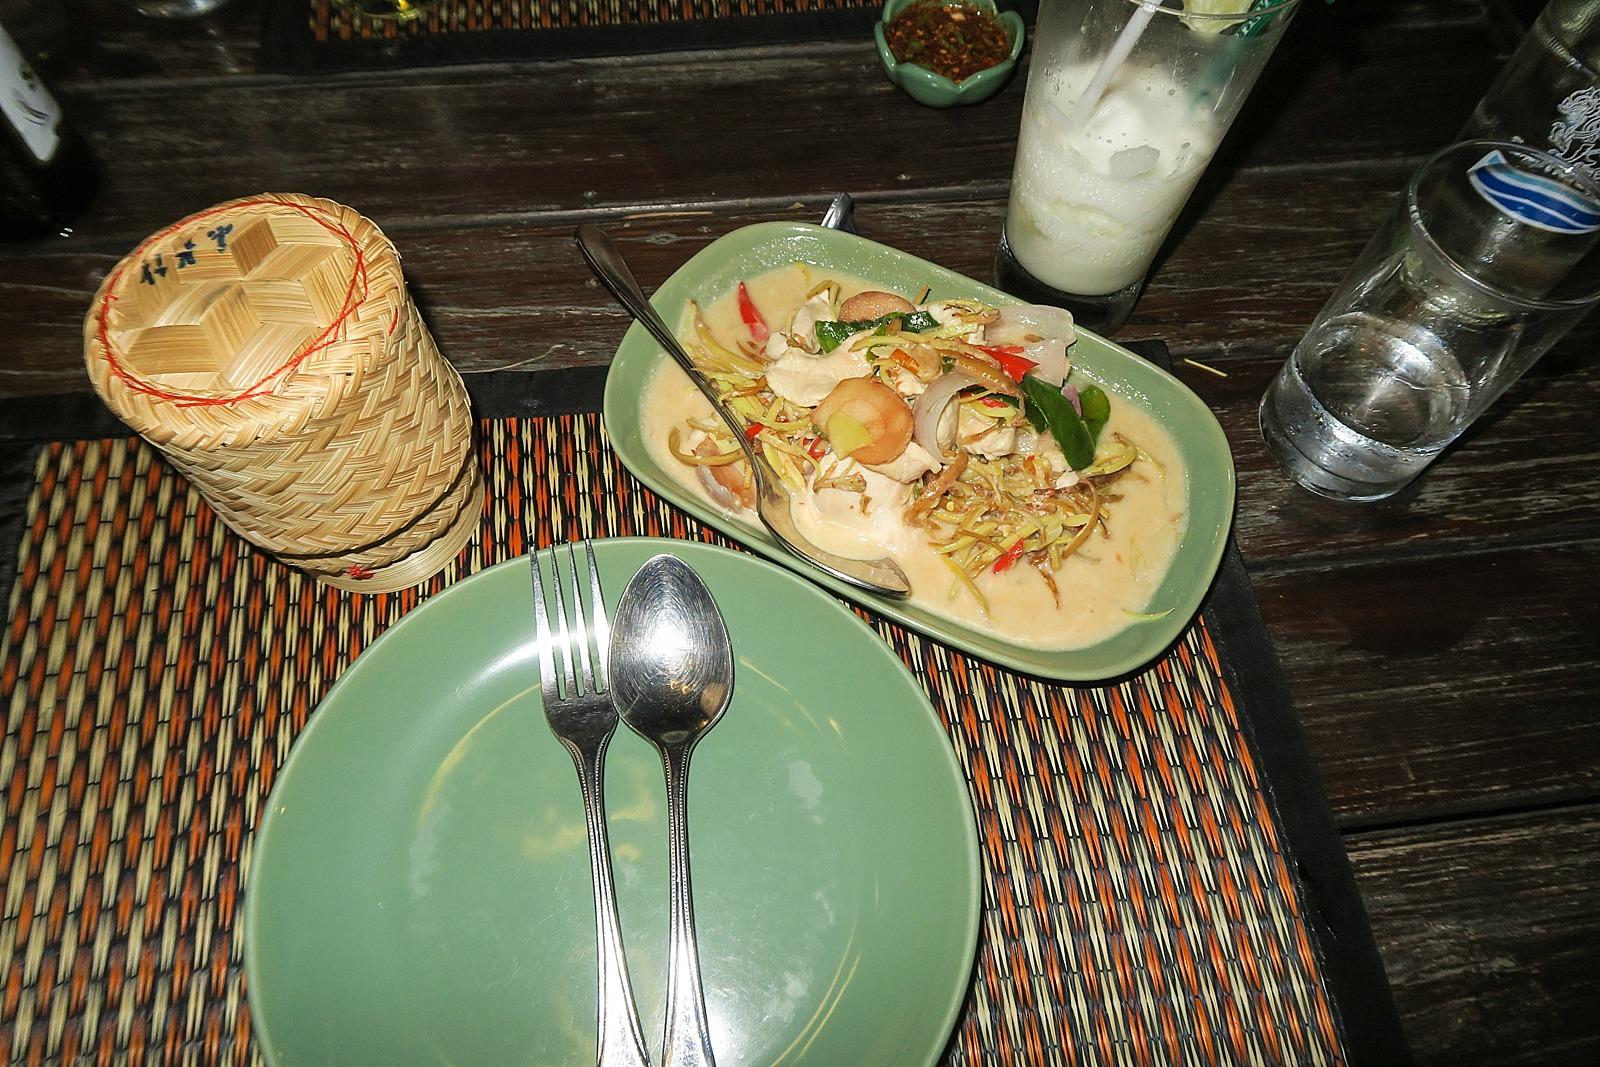 Thailand-diana-elizabeth-travel-blogger-phoenix-362